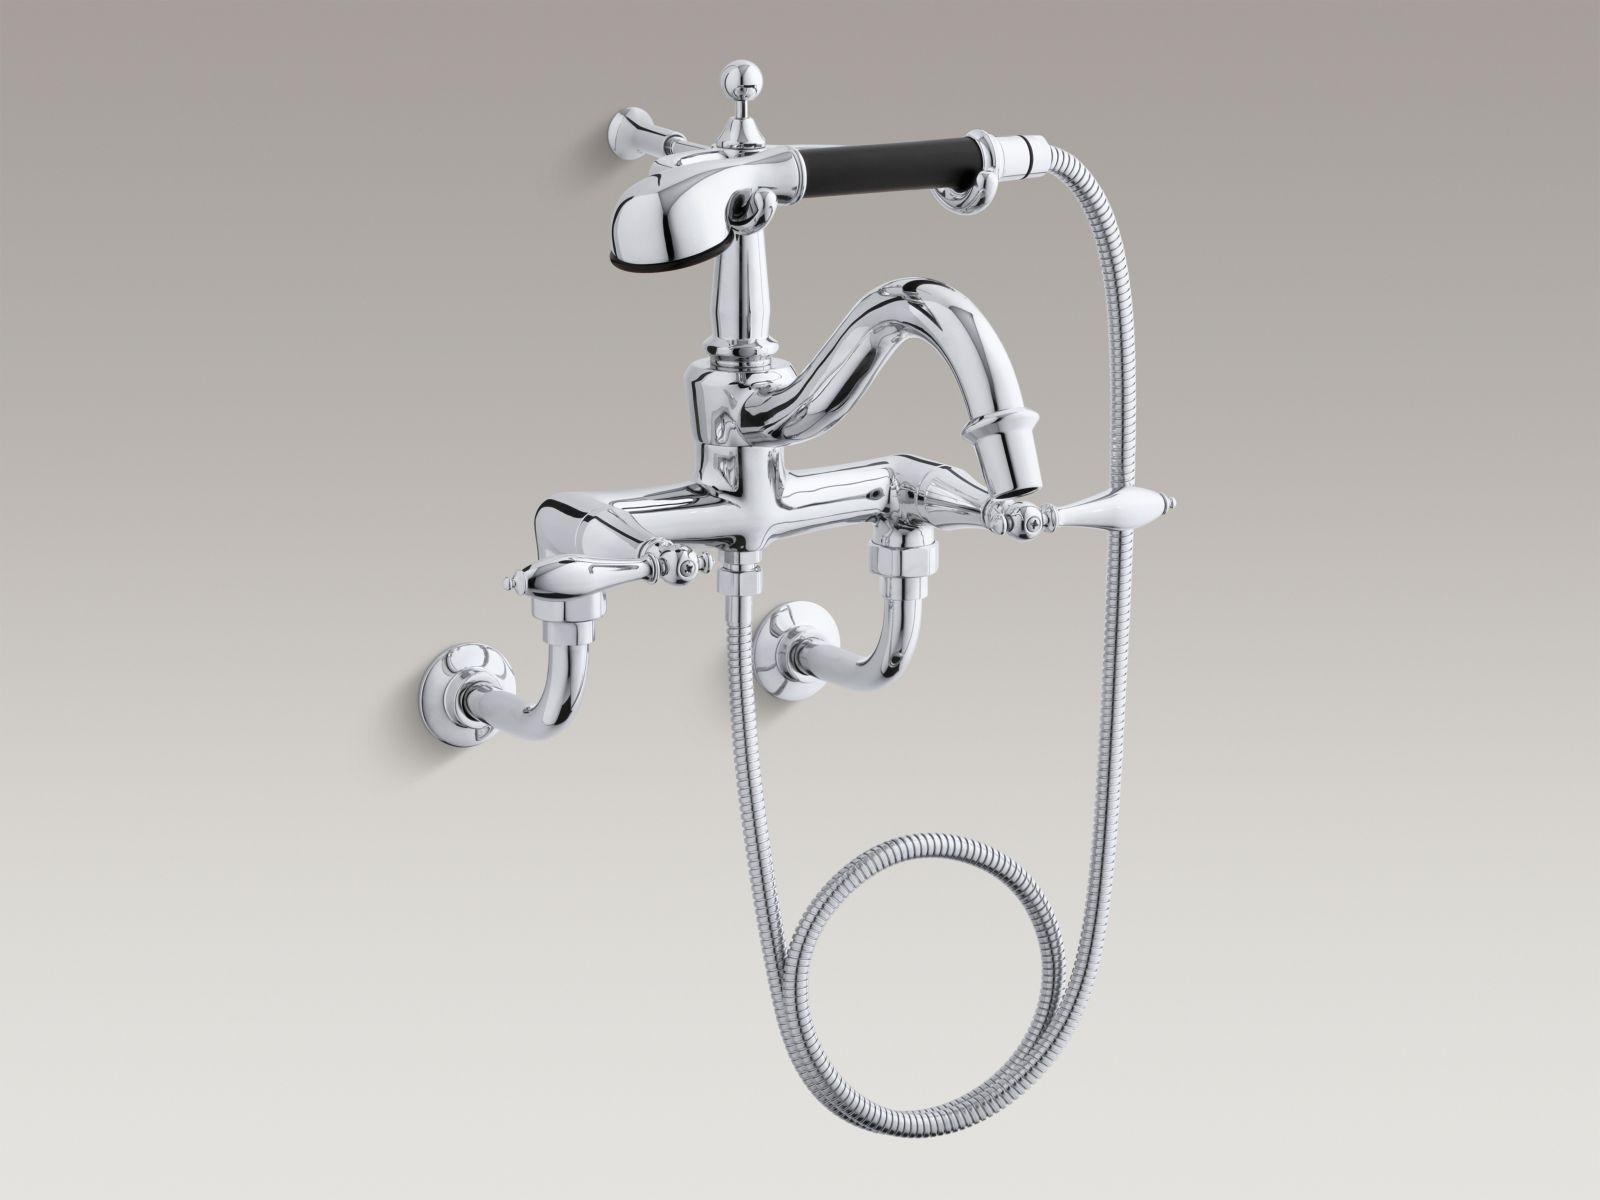 Ideas, kohler stillness tub faucet kohler stillness tub faucet buyplumbing category bathtub filler 1600 x 1200 1  .